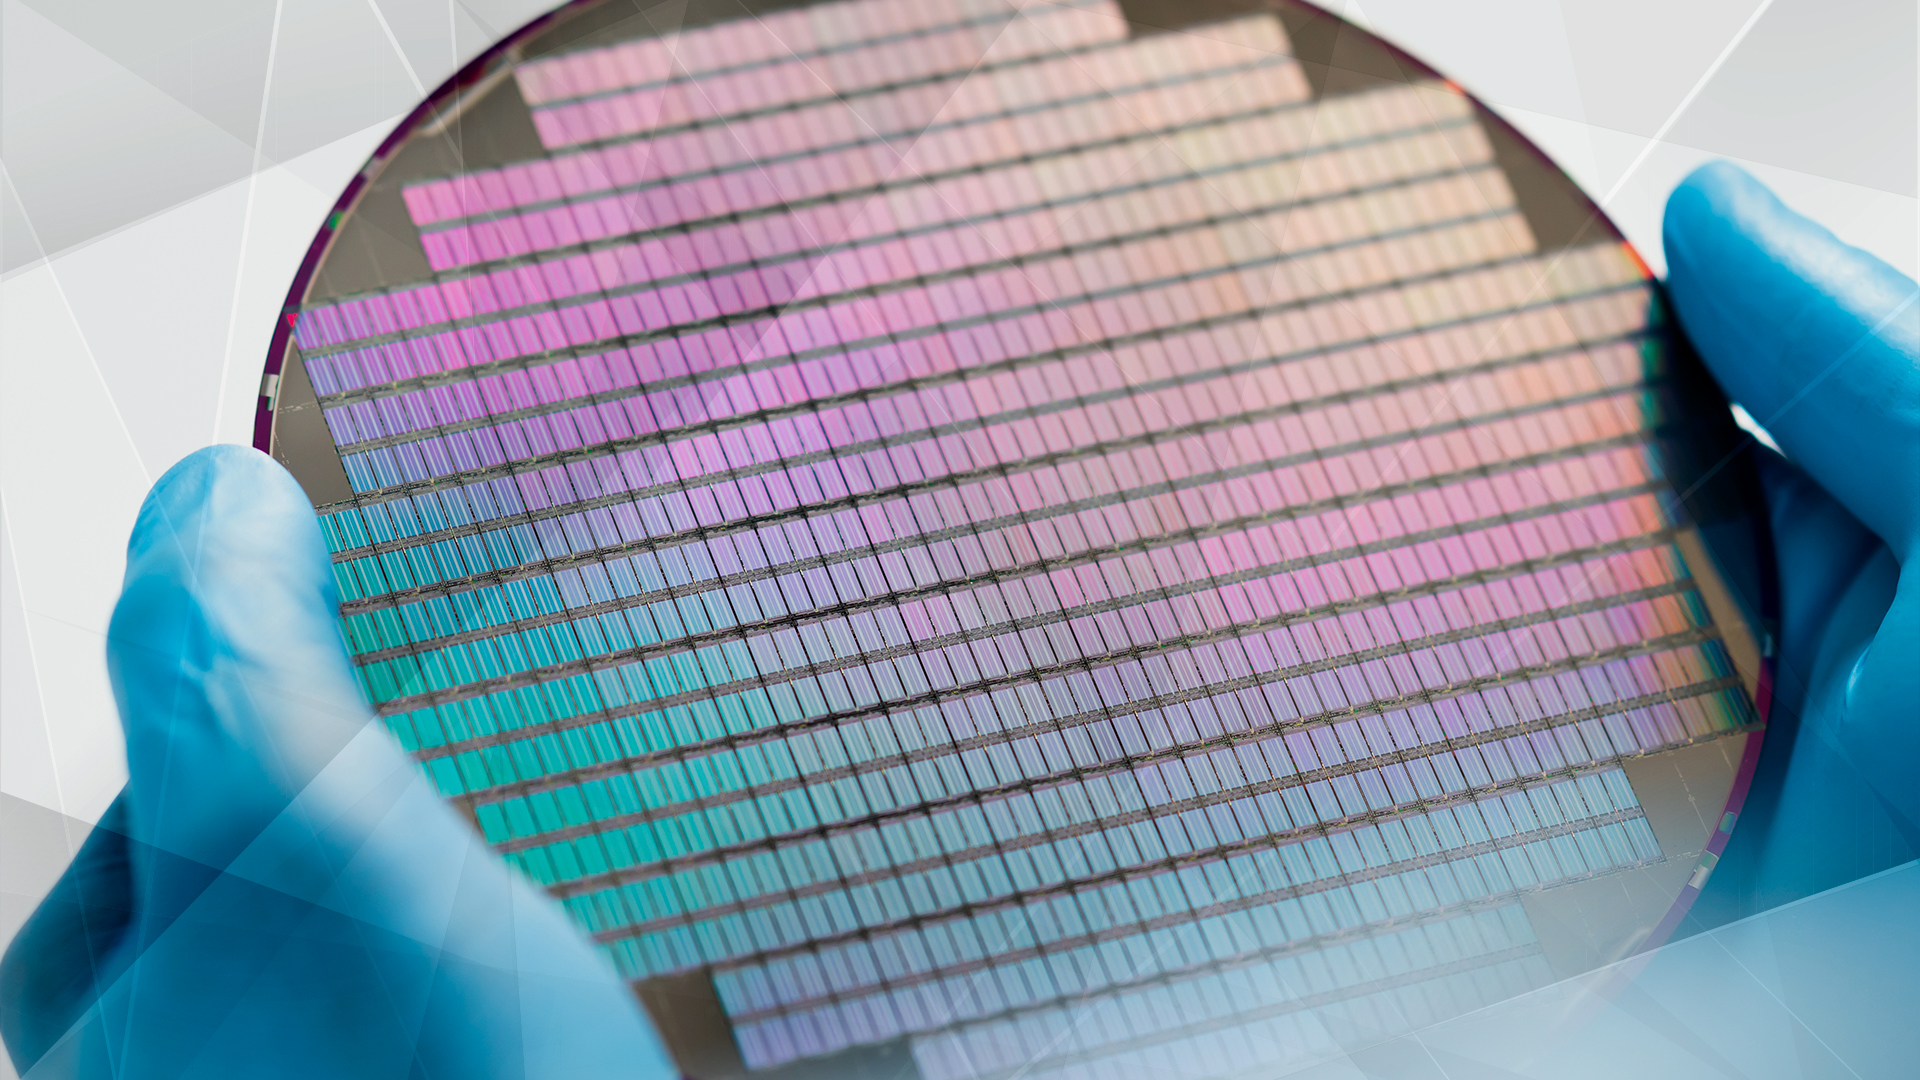 Prozessor, Cpu, Chip, SoC, Hardware, Gpu, Prozessoren, Chips, Labor, Nanometer, System On Chip, Wafer, Handschuhe